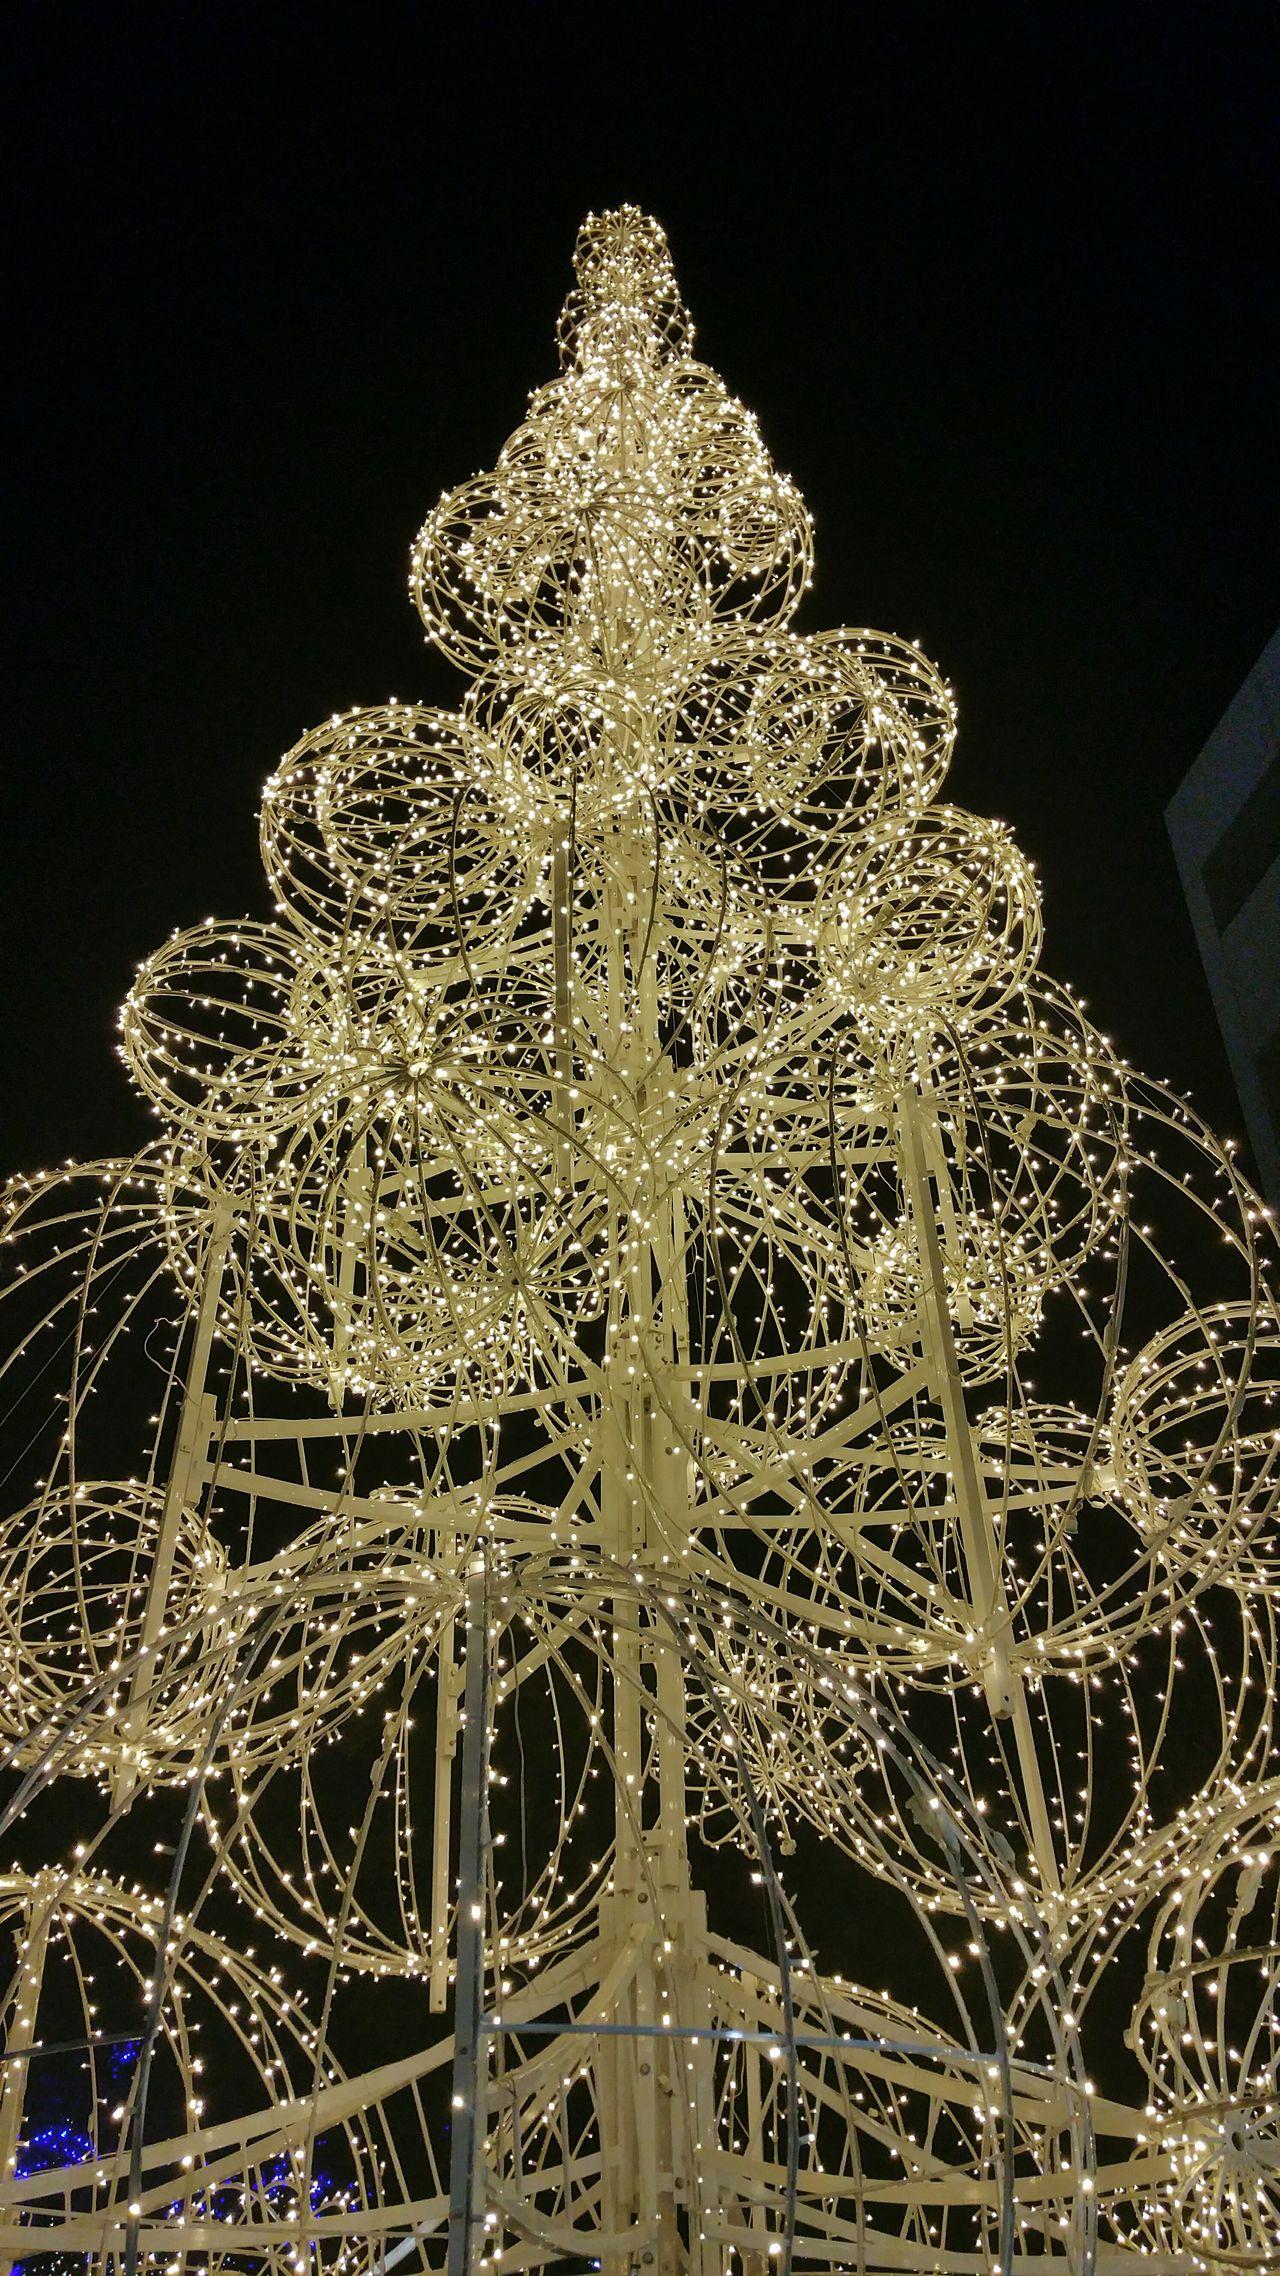 Riverside California Riverside Downtown Riverside Christmas Tree Christmas Lights Christmas Decorations Christmas Time Southern California Riverside County